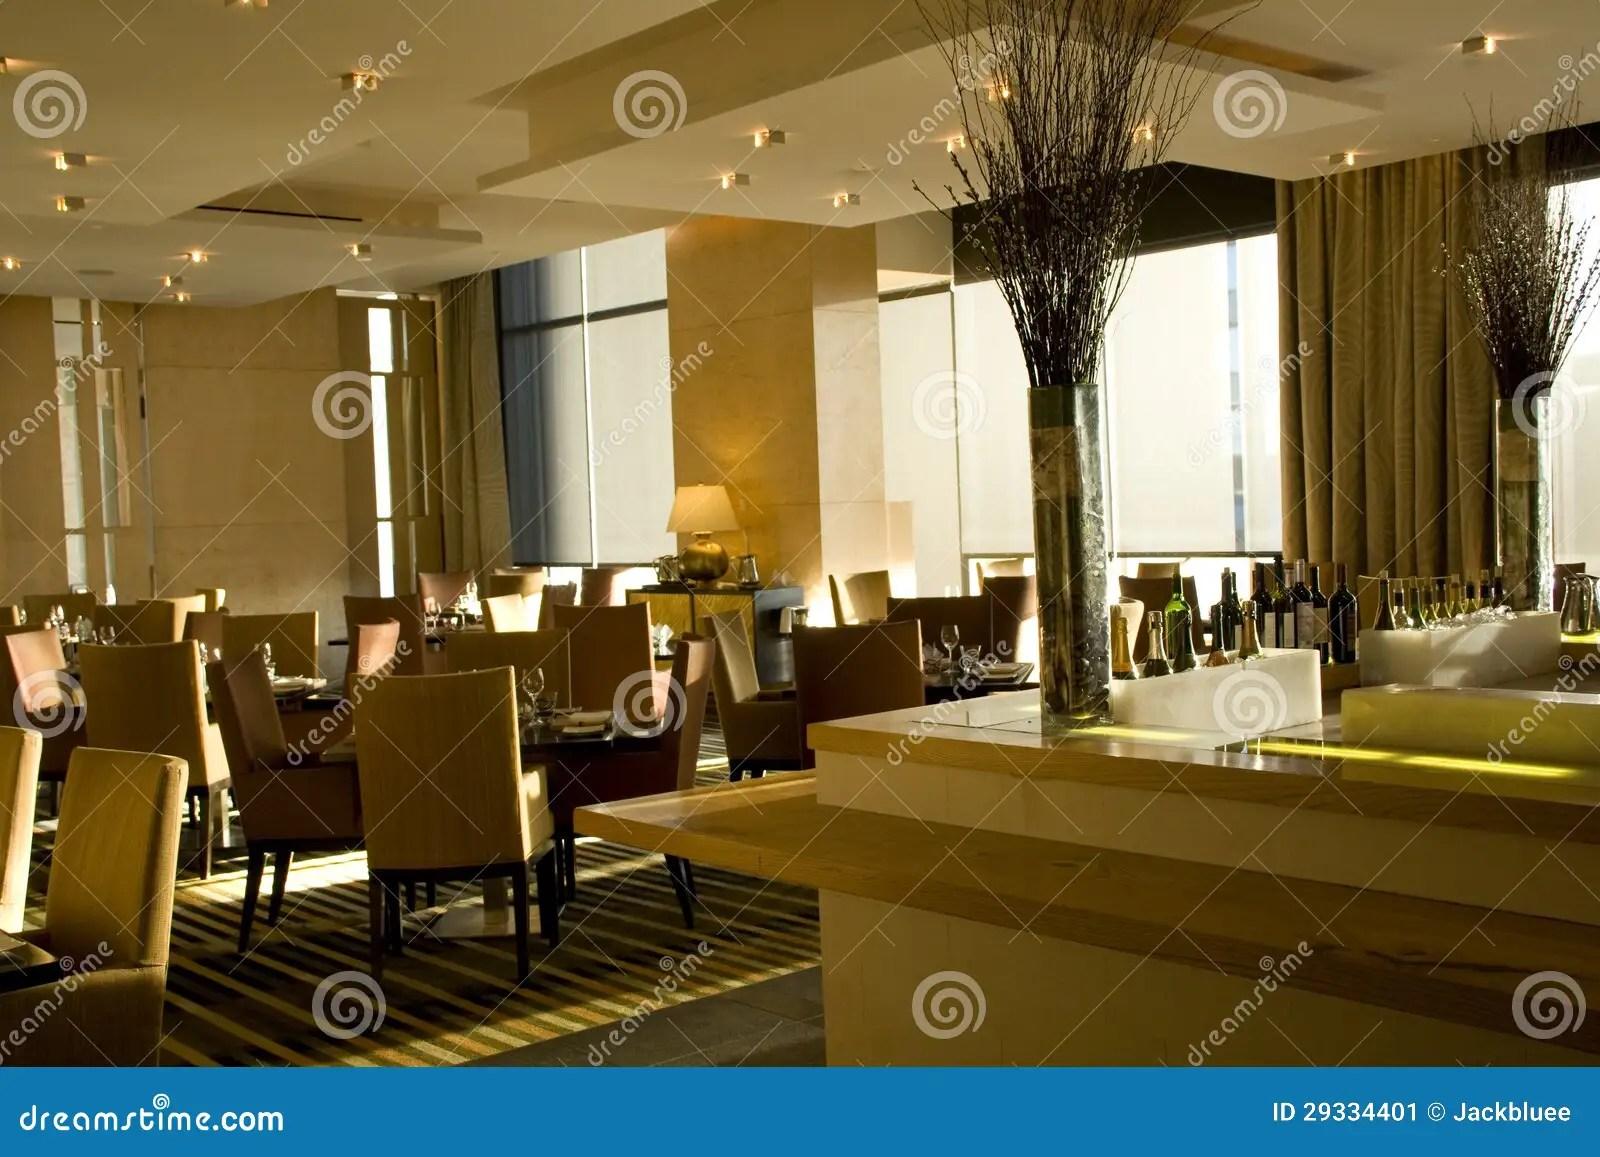 modern sofa plans free ashley sleeper reviews luxury bar restaurant interiors stock image - image: 29334401